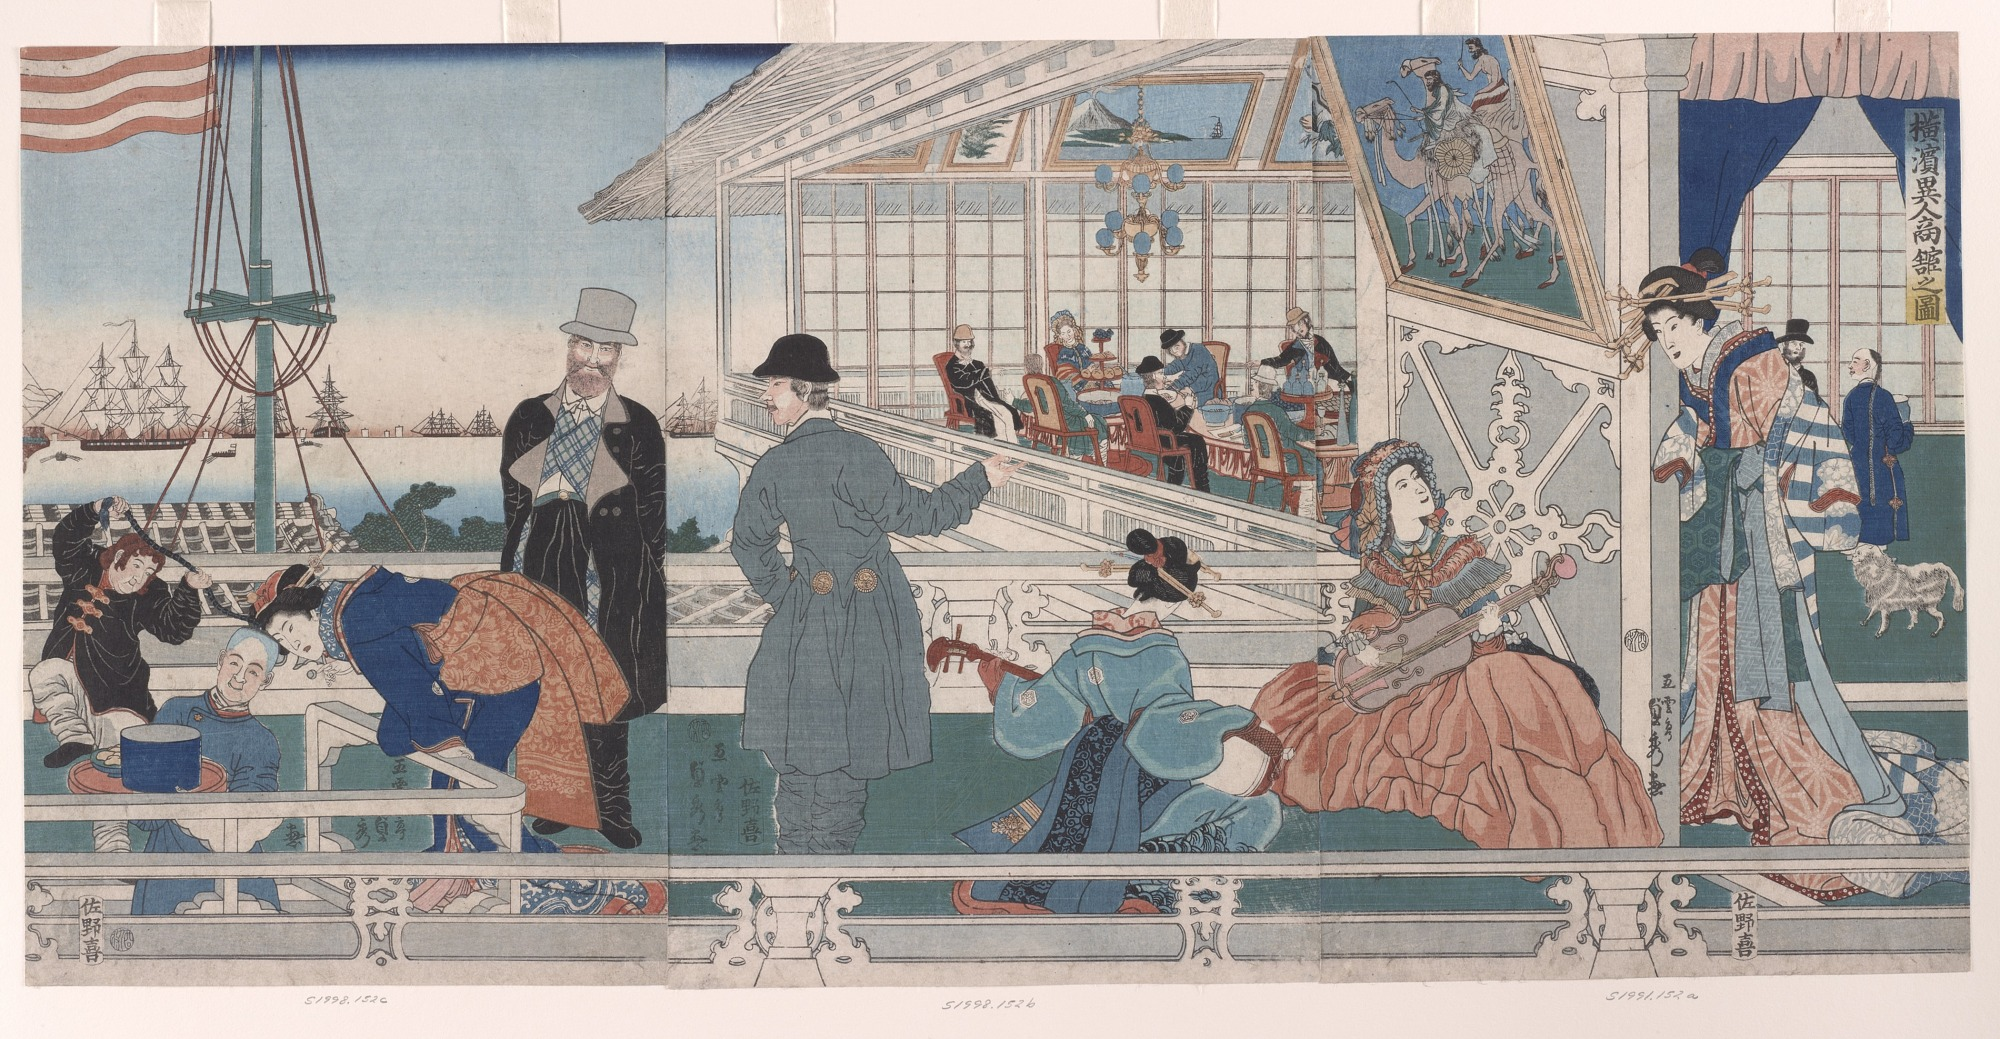 Picture of a Mercantile Establishment in Yokohama